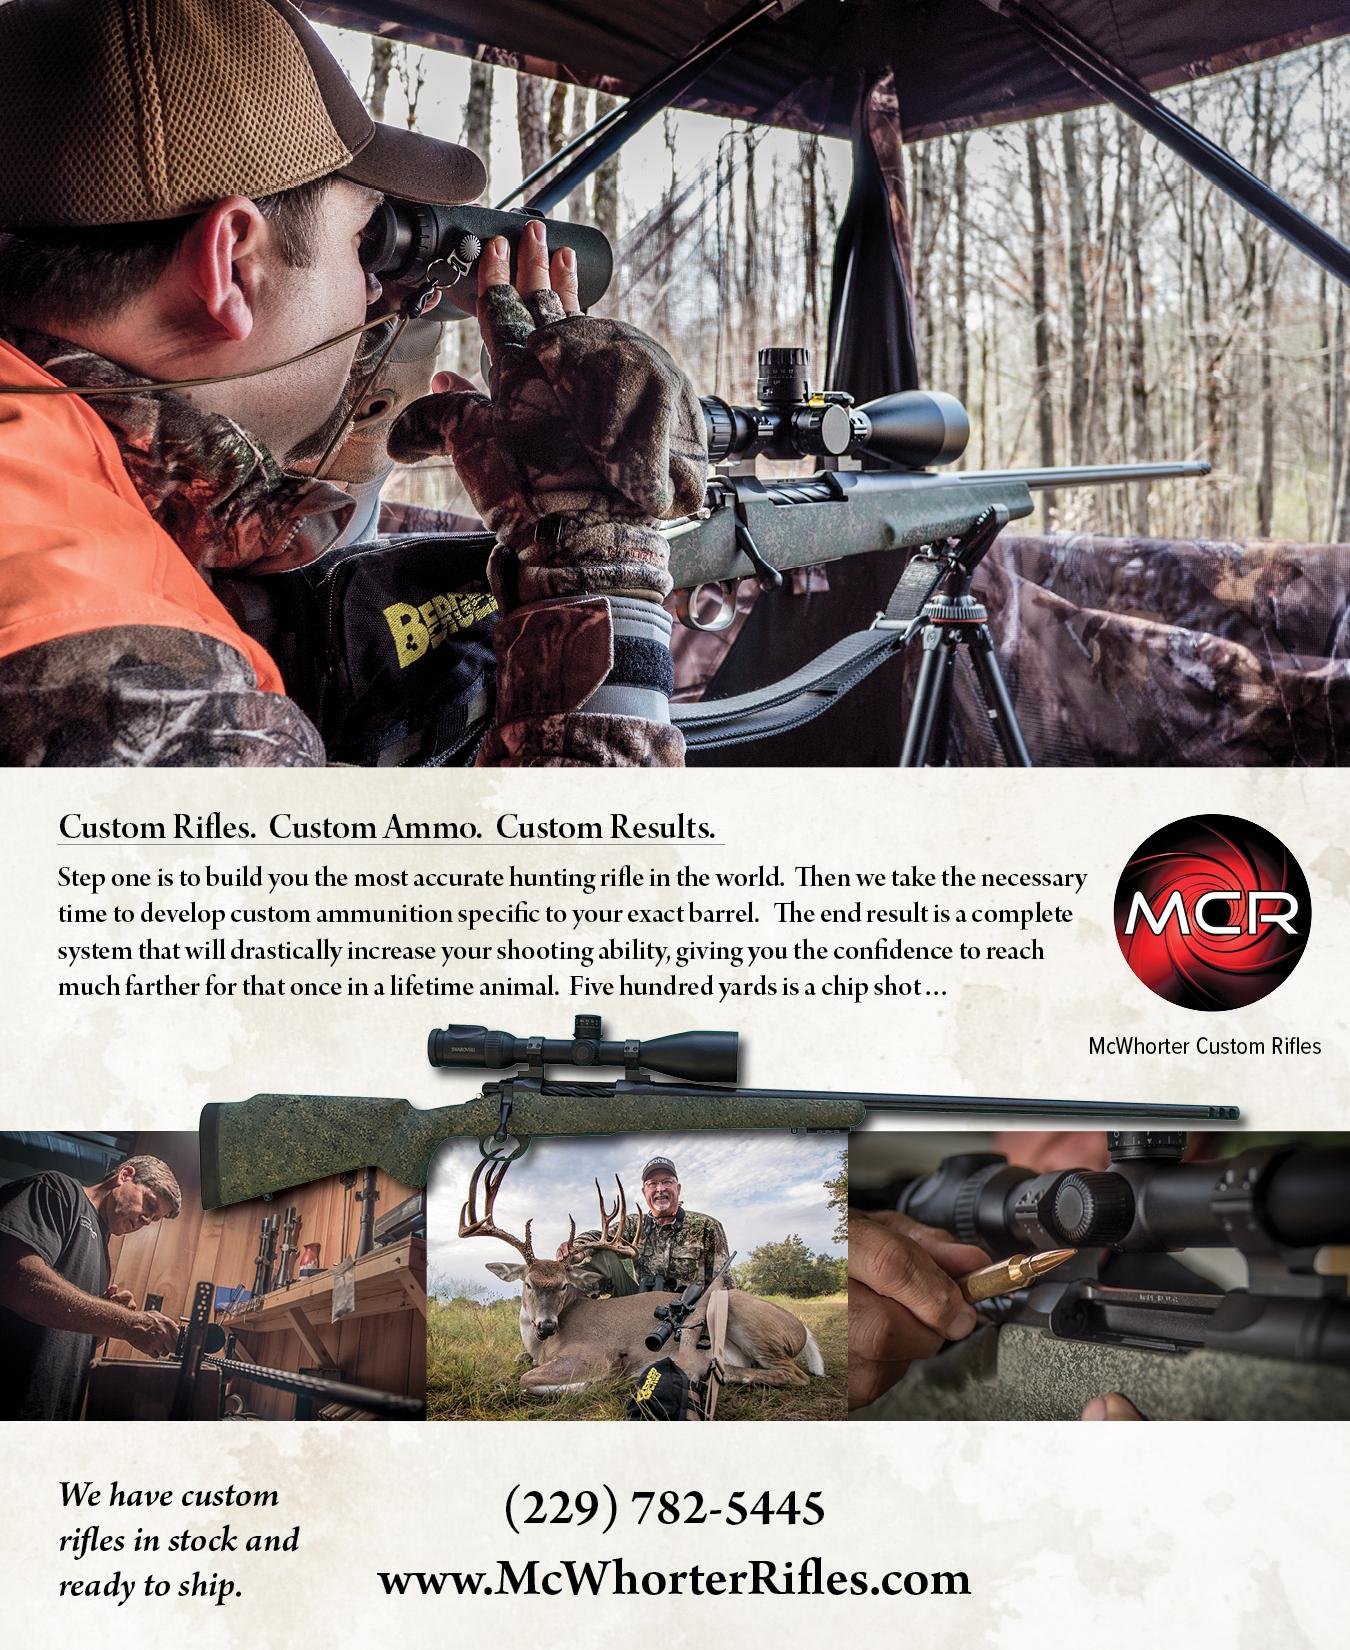 McWhorter Custom Rifles